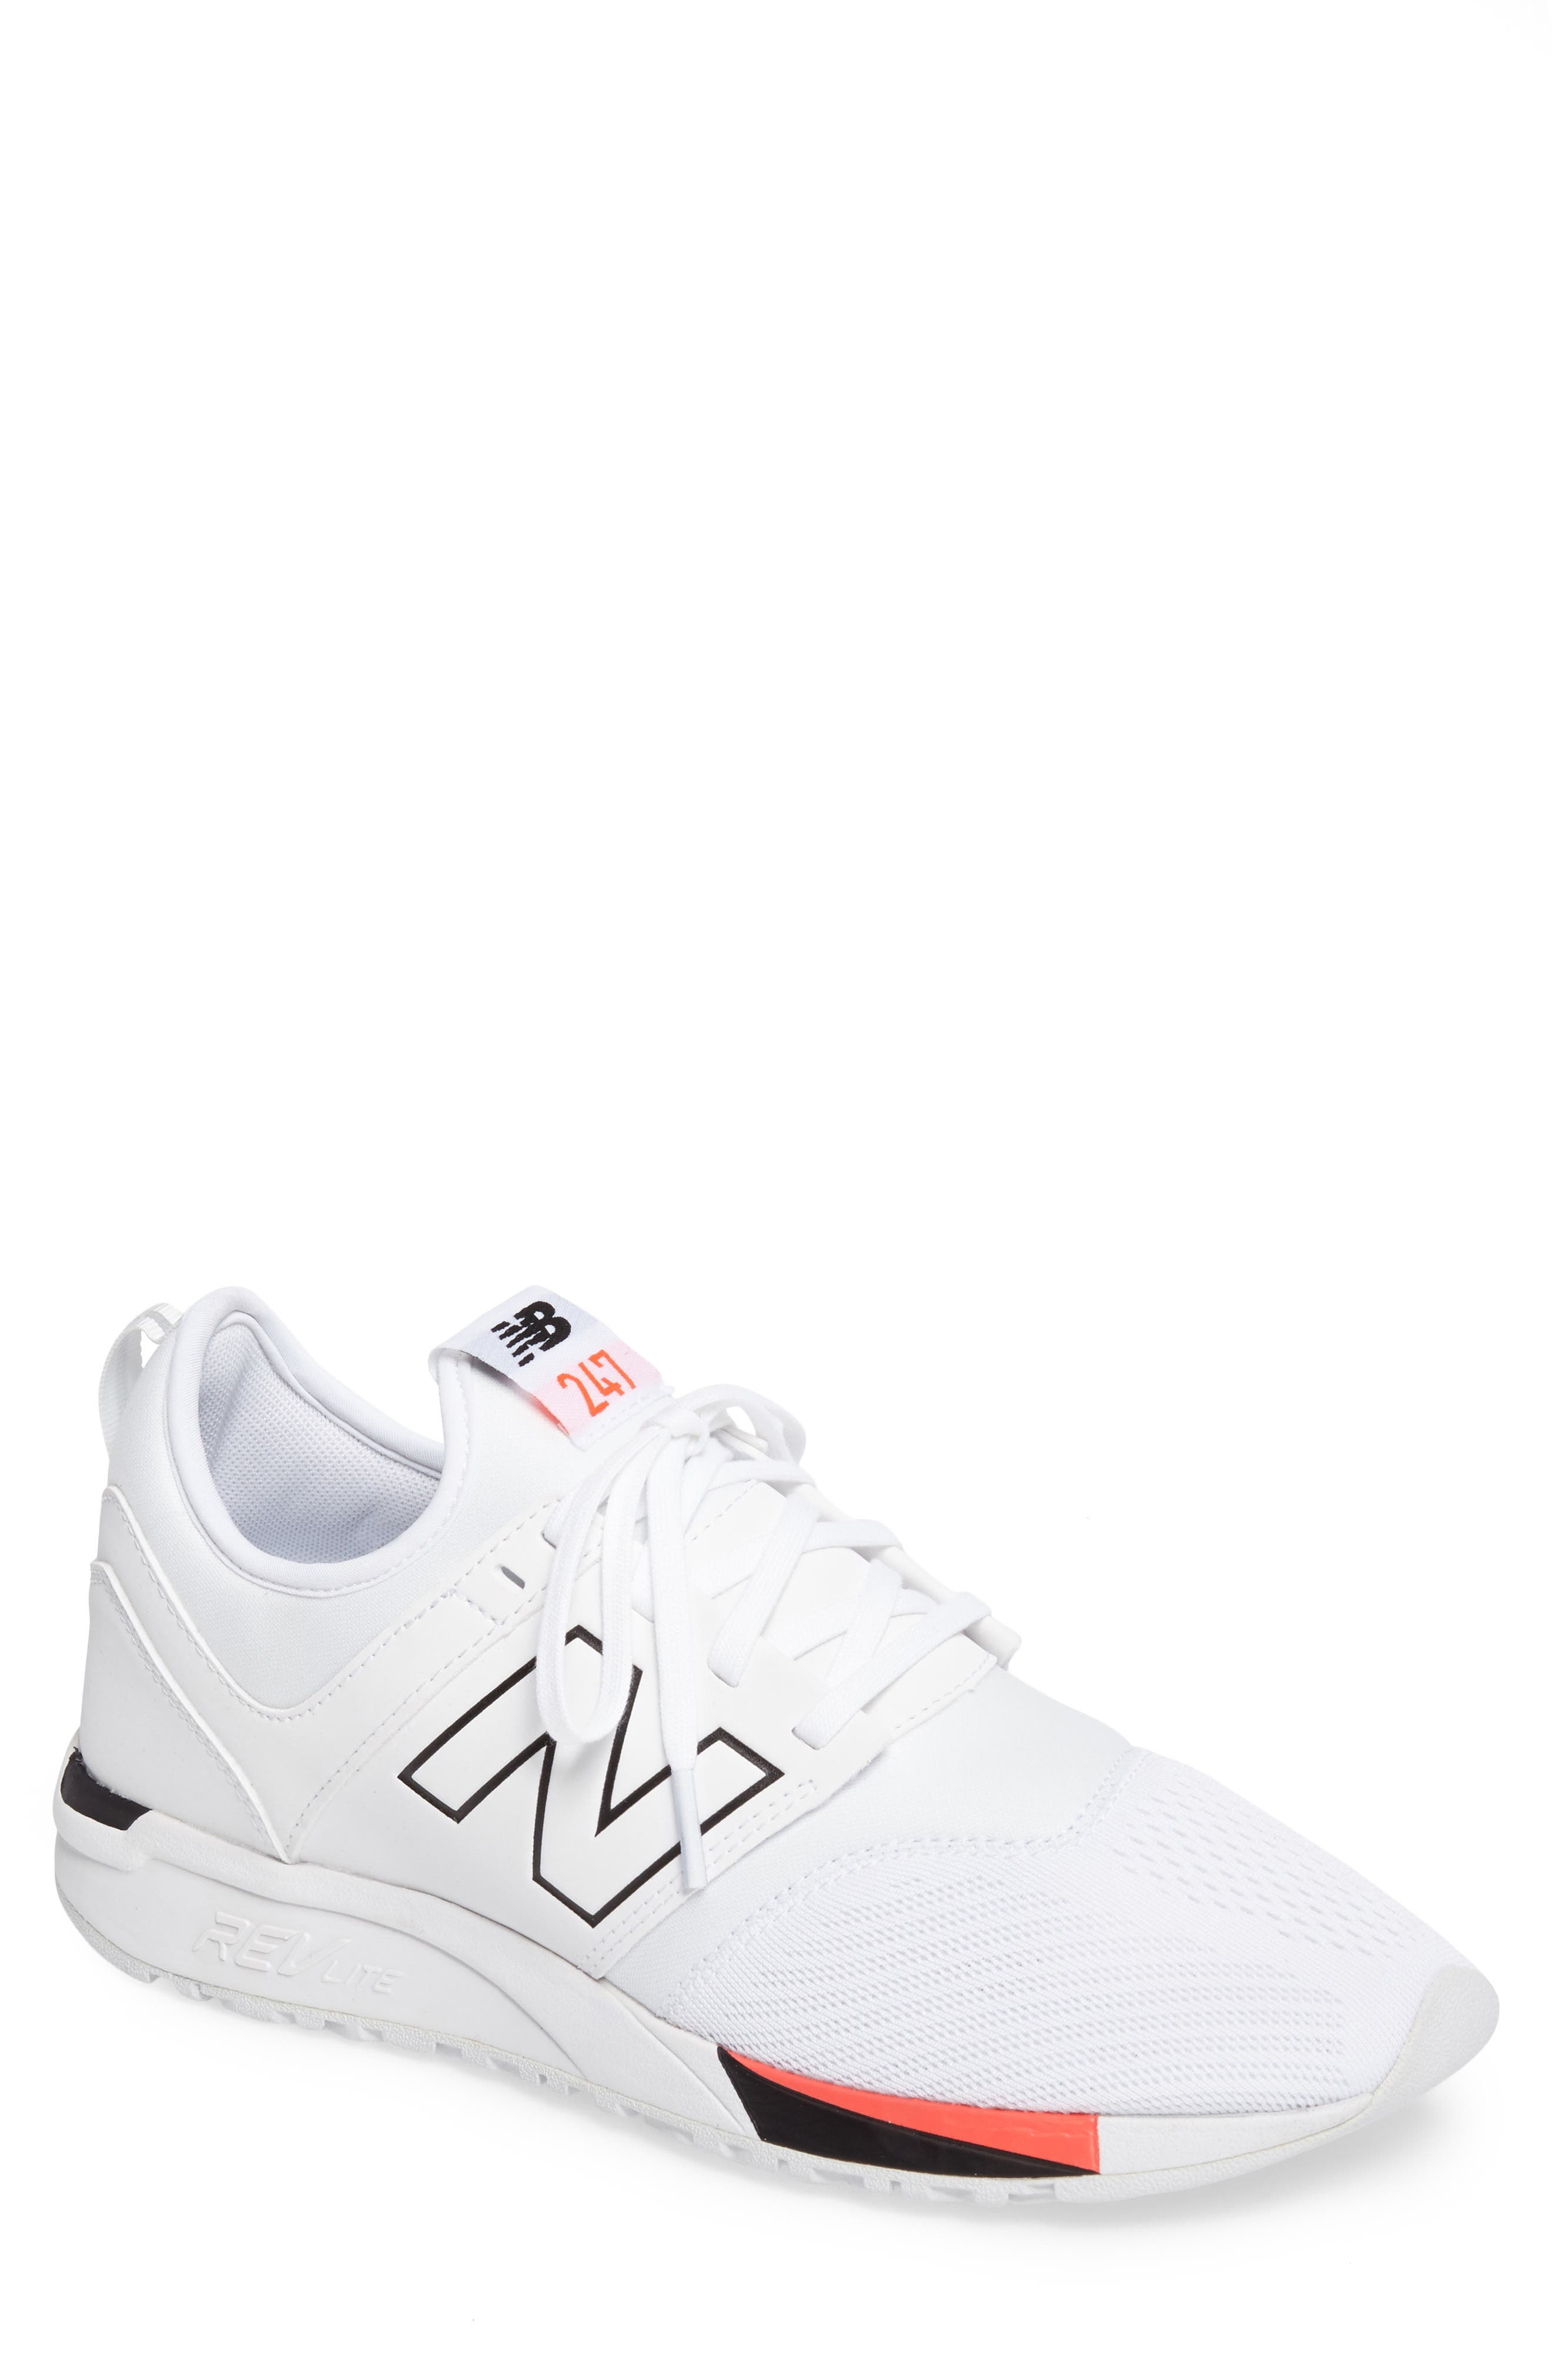 247 Classic Plus Sneaker,                         Main,                         color,